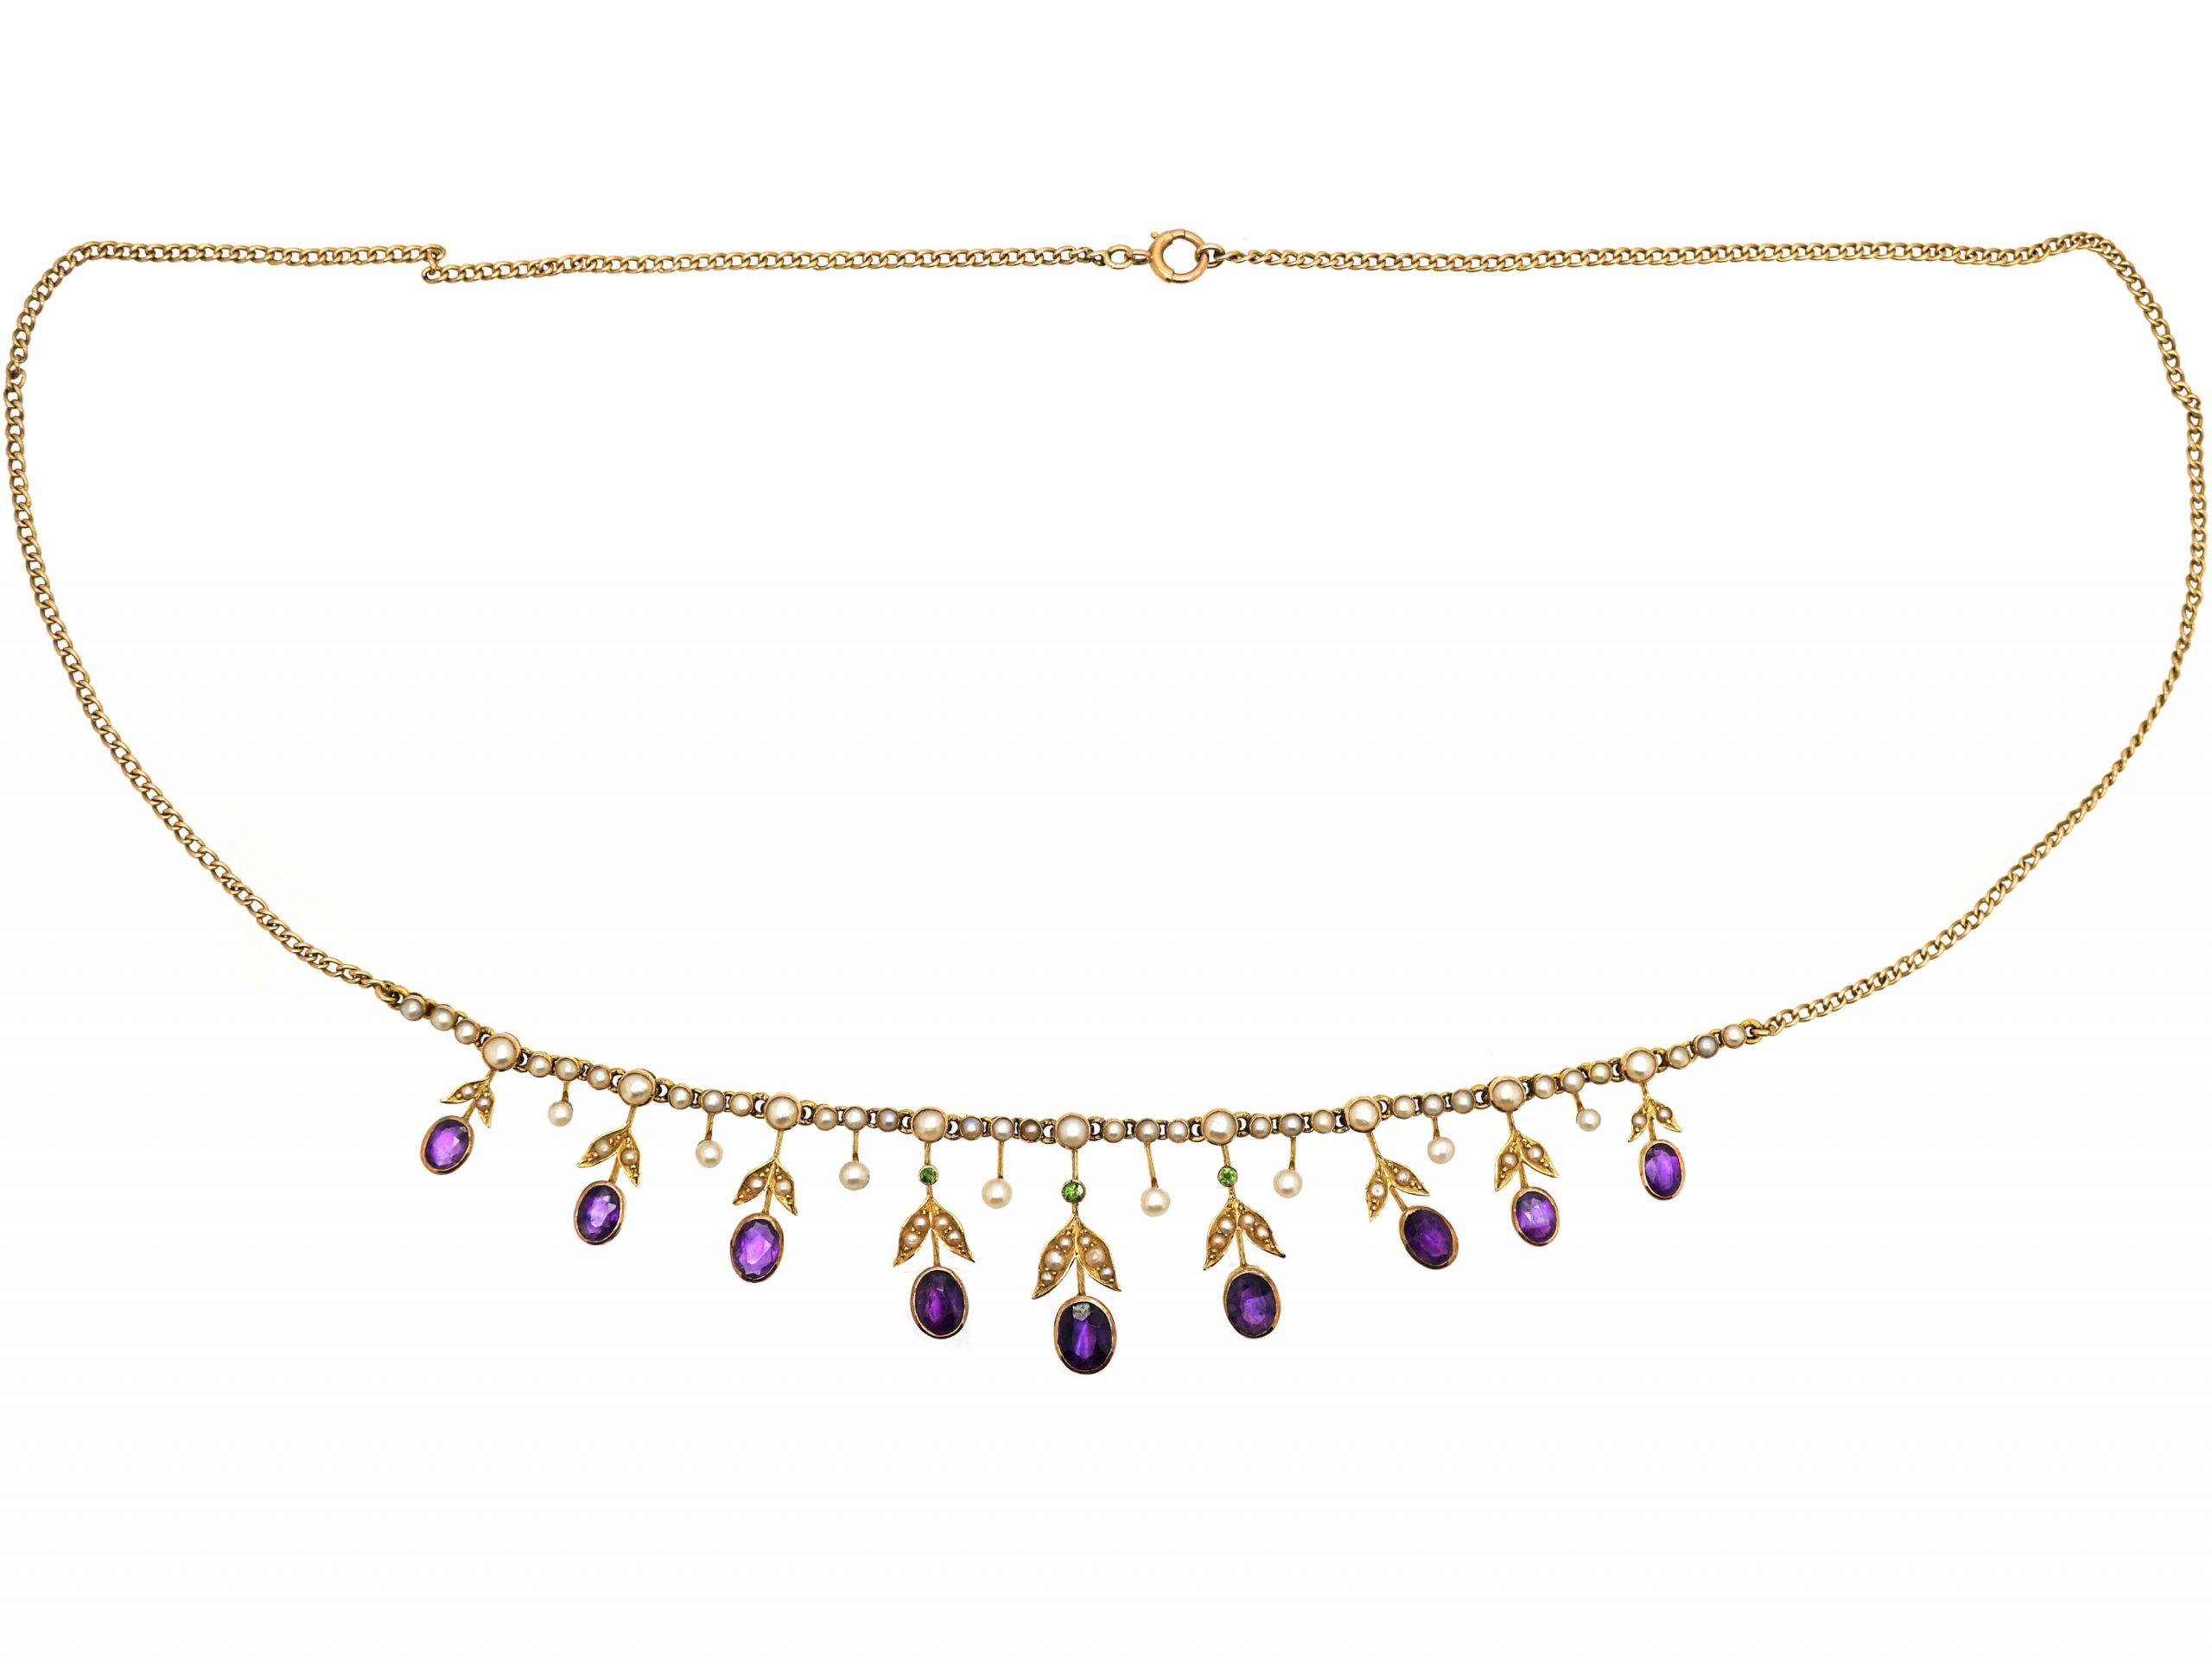 Edwardian 15ct Gold Suffragette Necklace